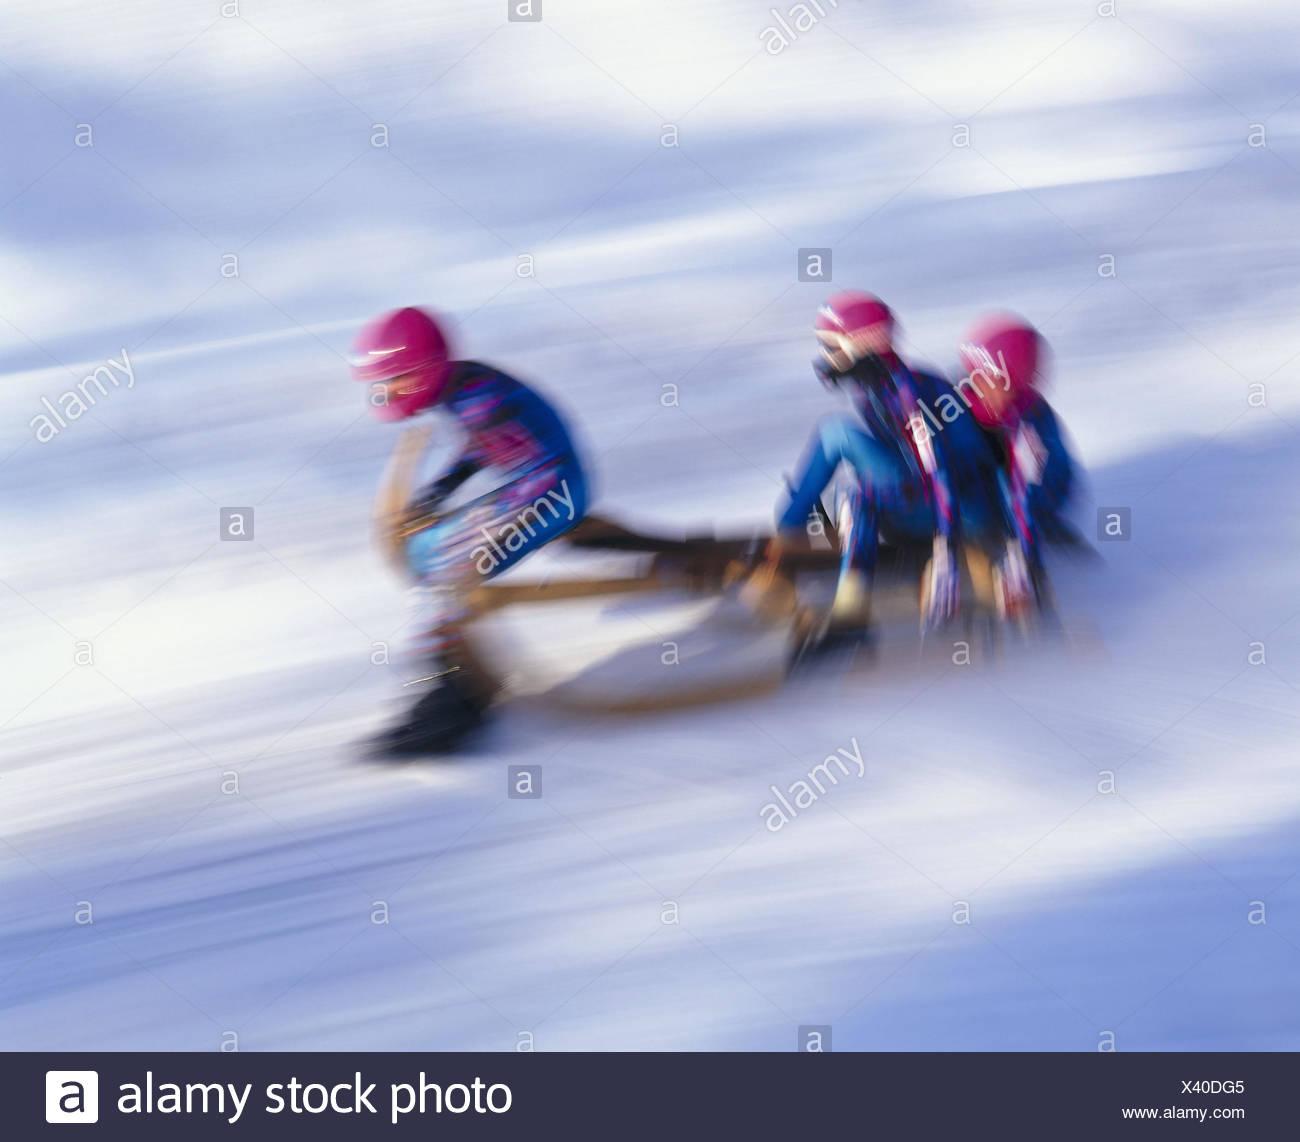 Austria, Tyrol, Seefeld, Horn Slide Race, Participant, Blur Sport, Fun